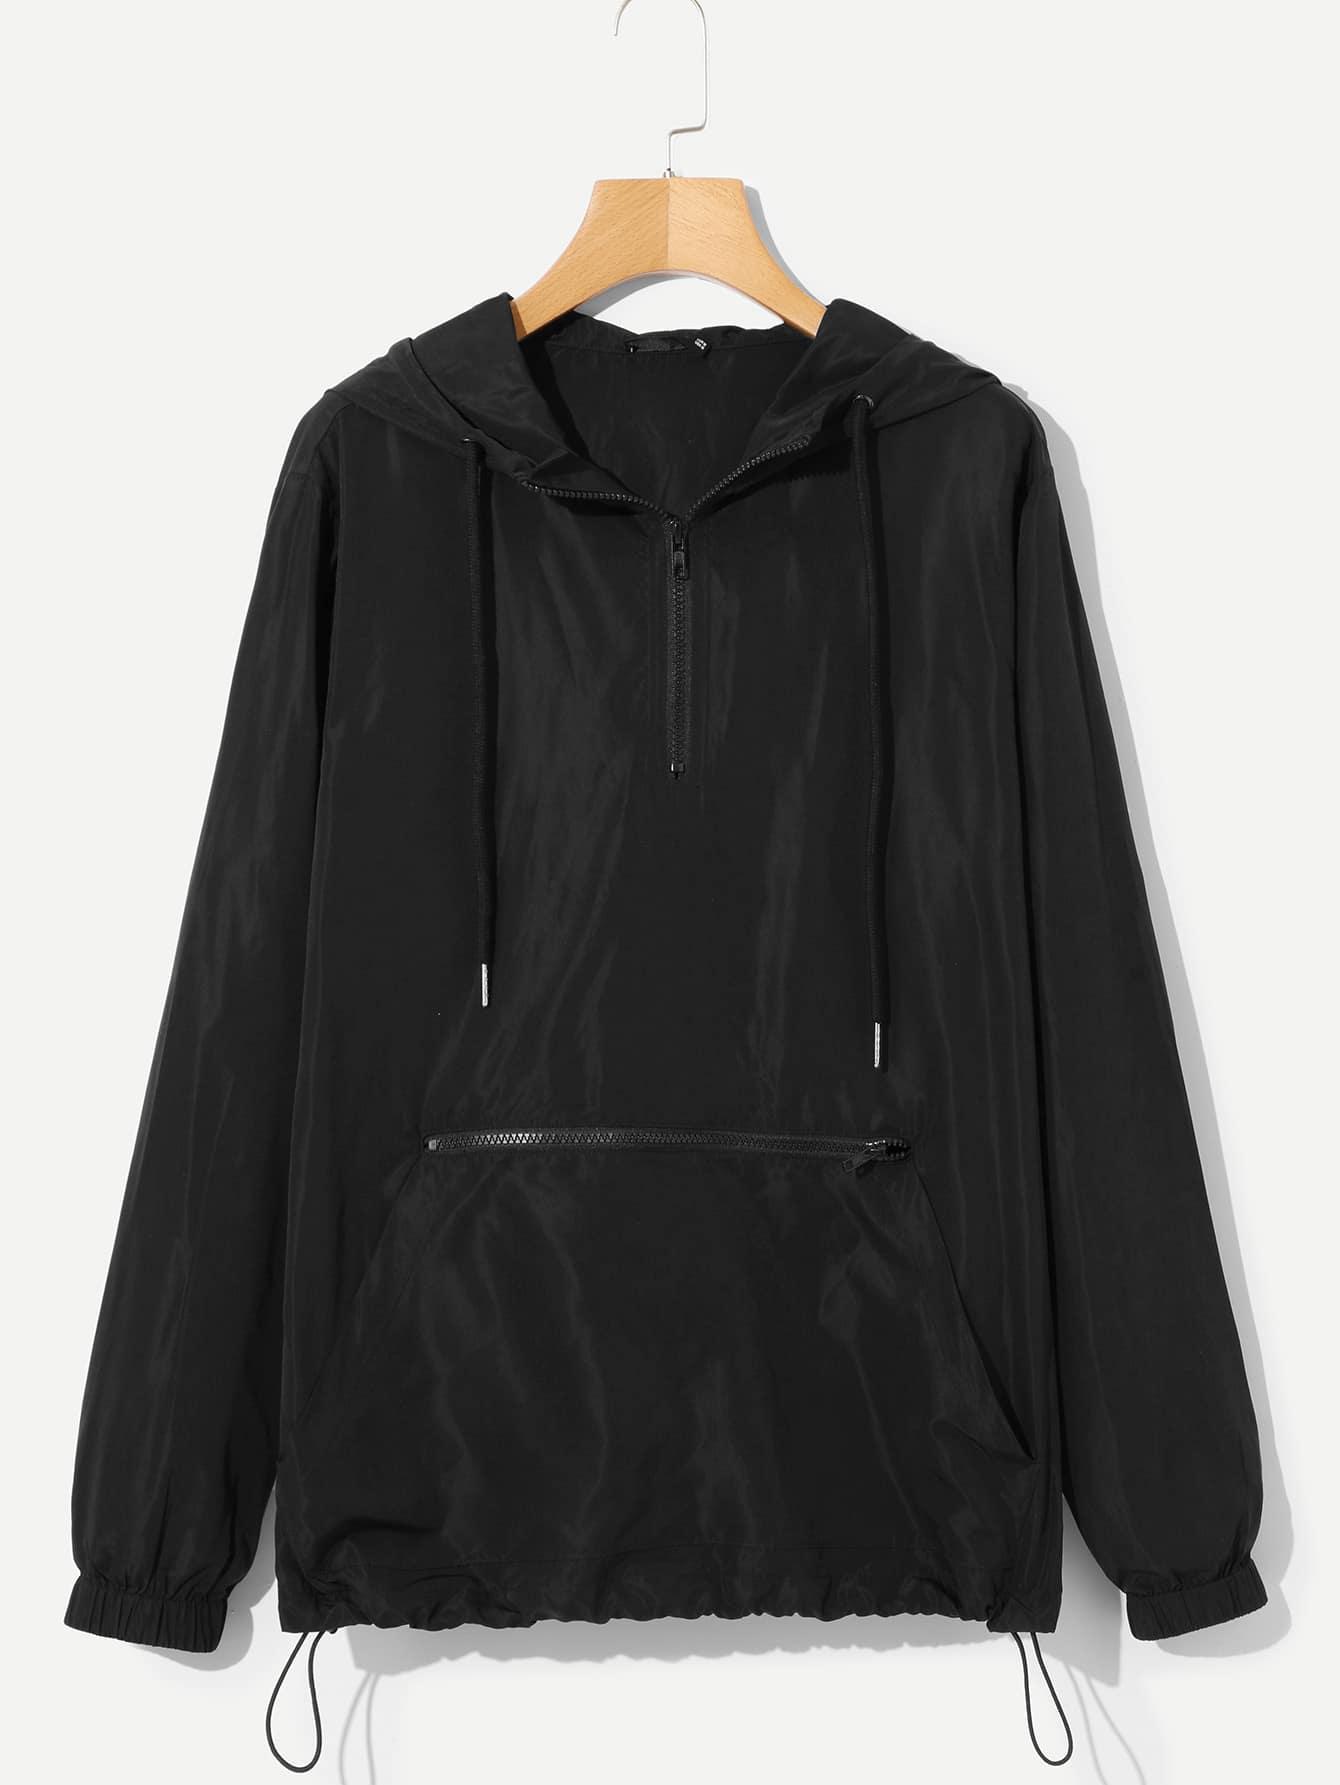 Drum major jacket fashion 81